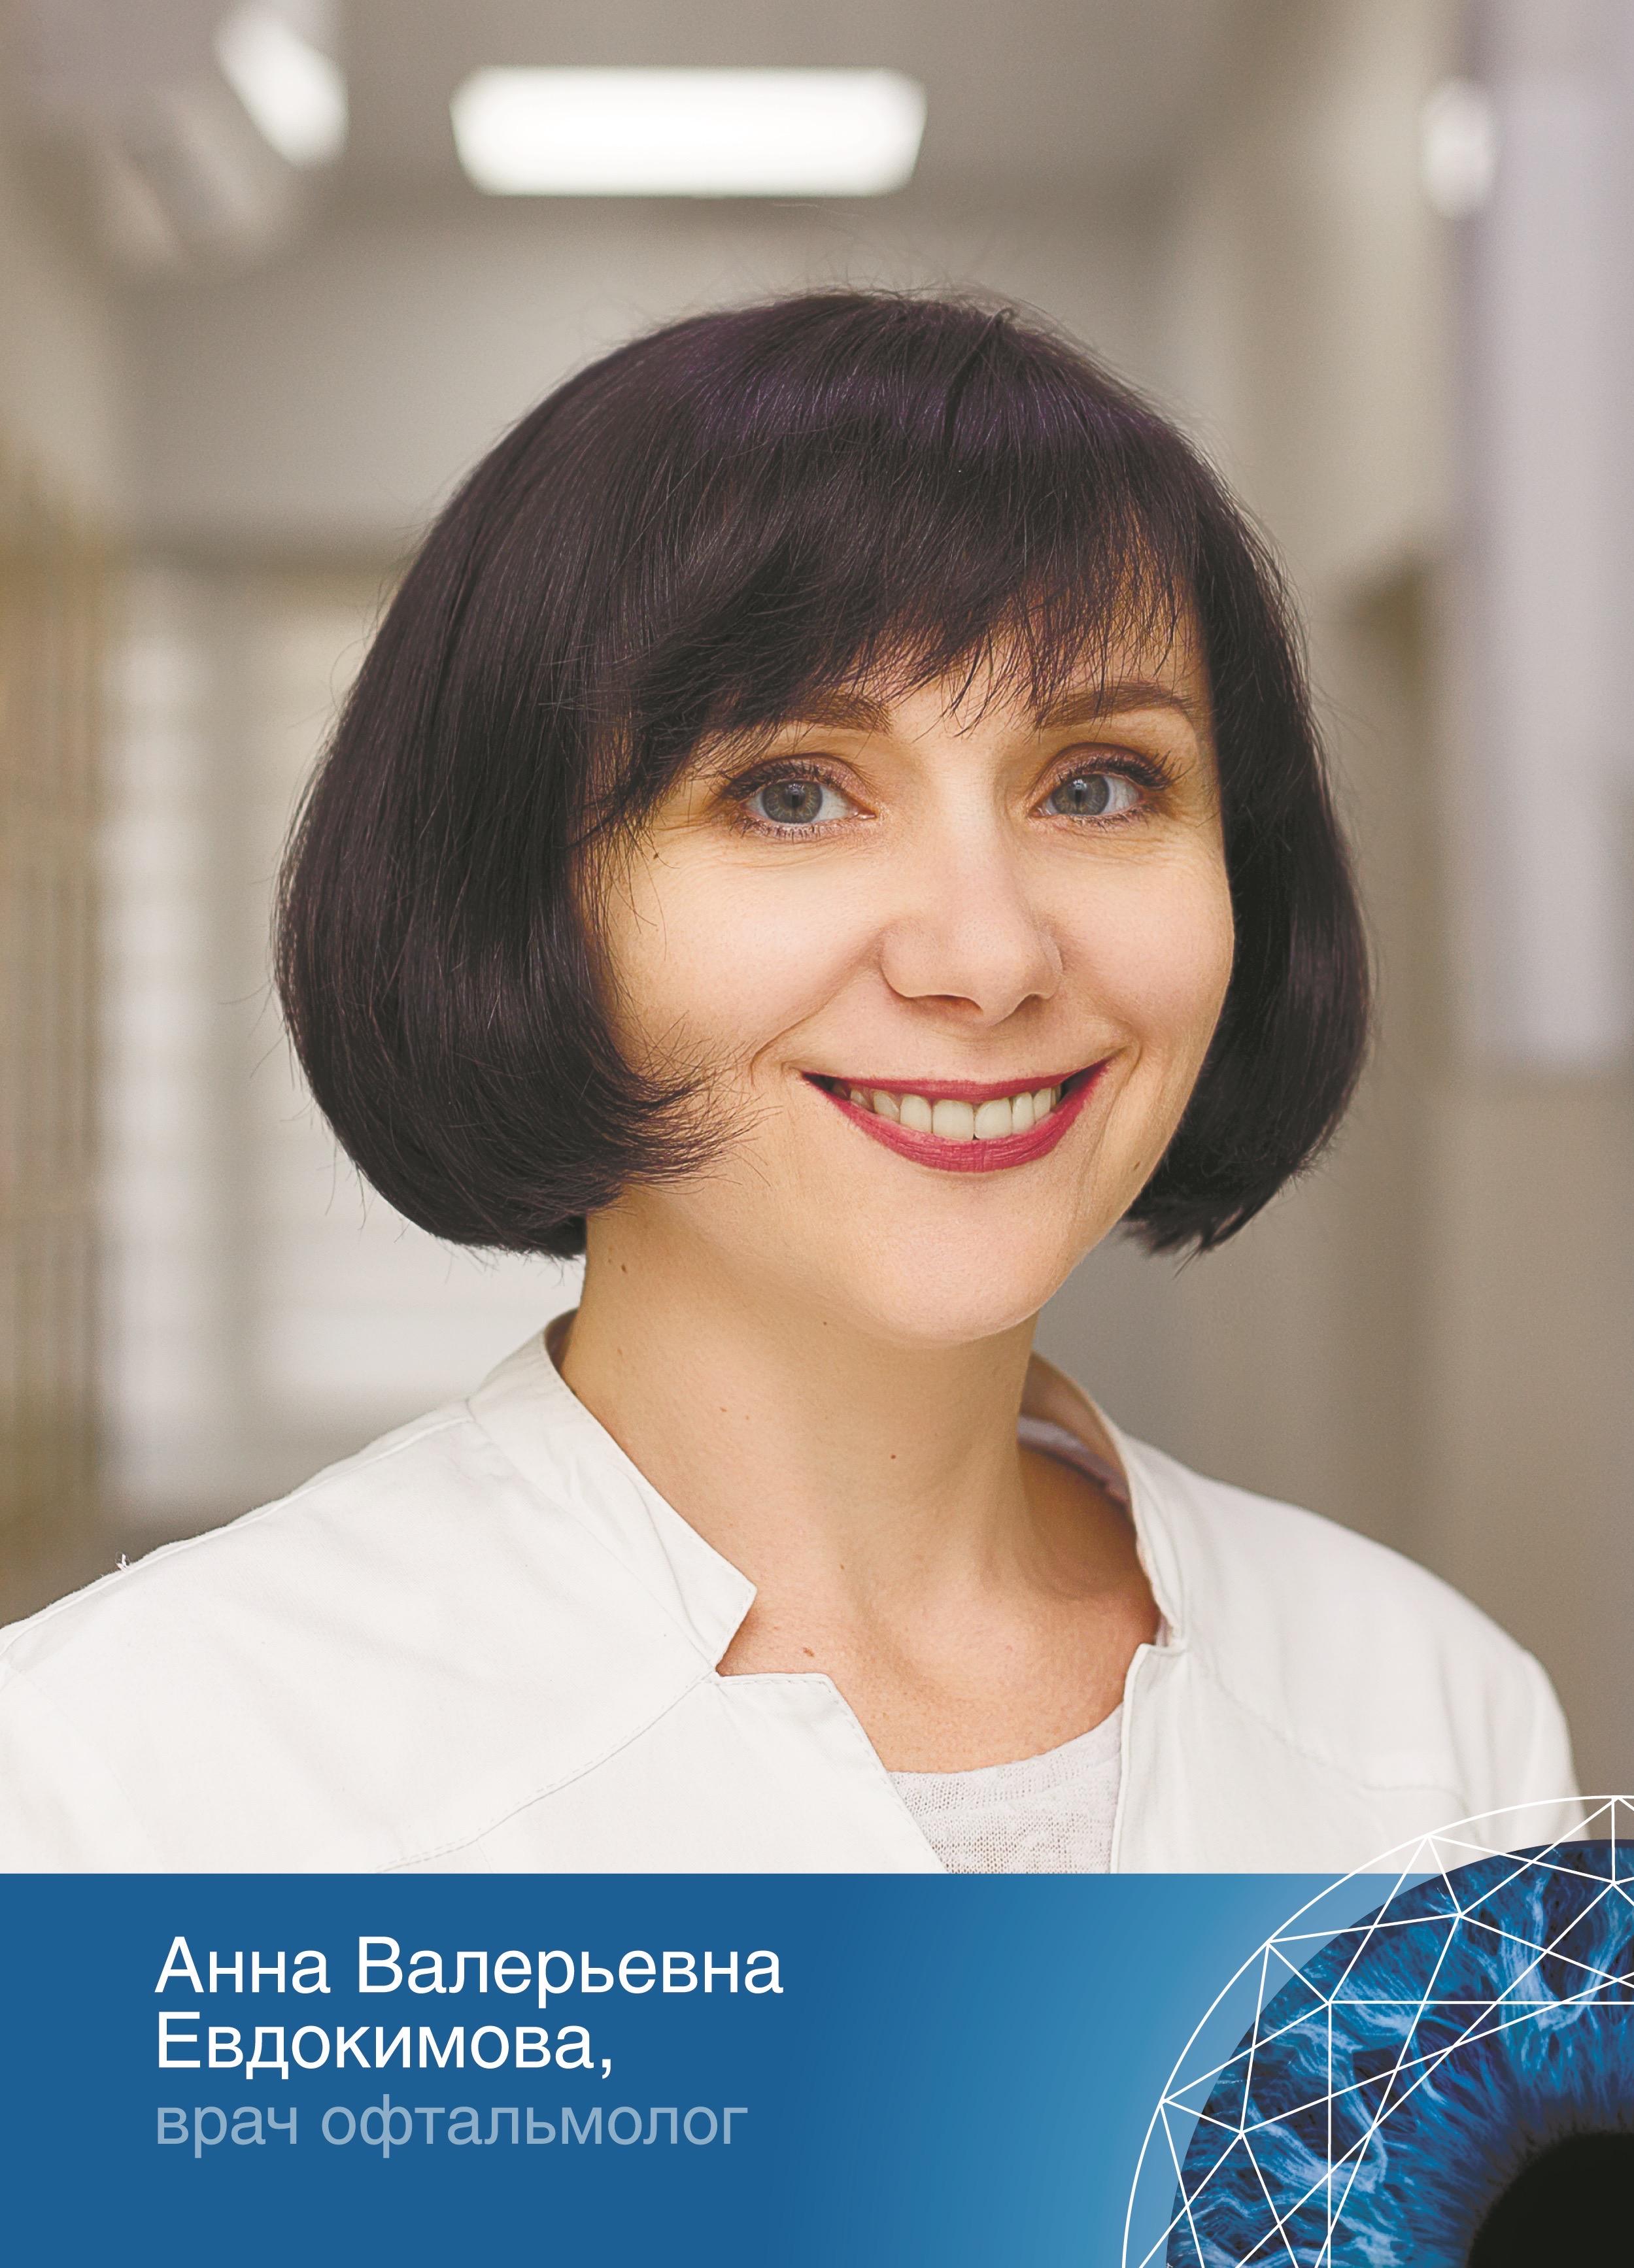 Евдокимова Анна Валерьевна